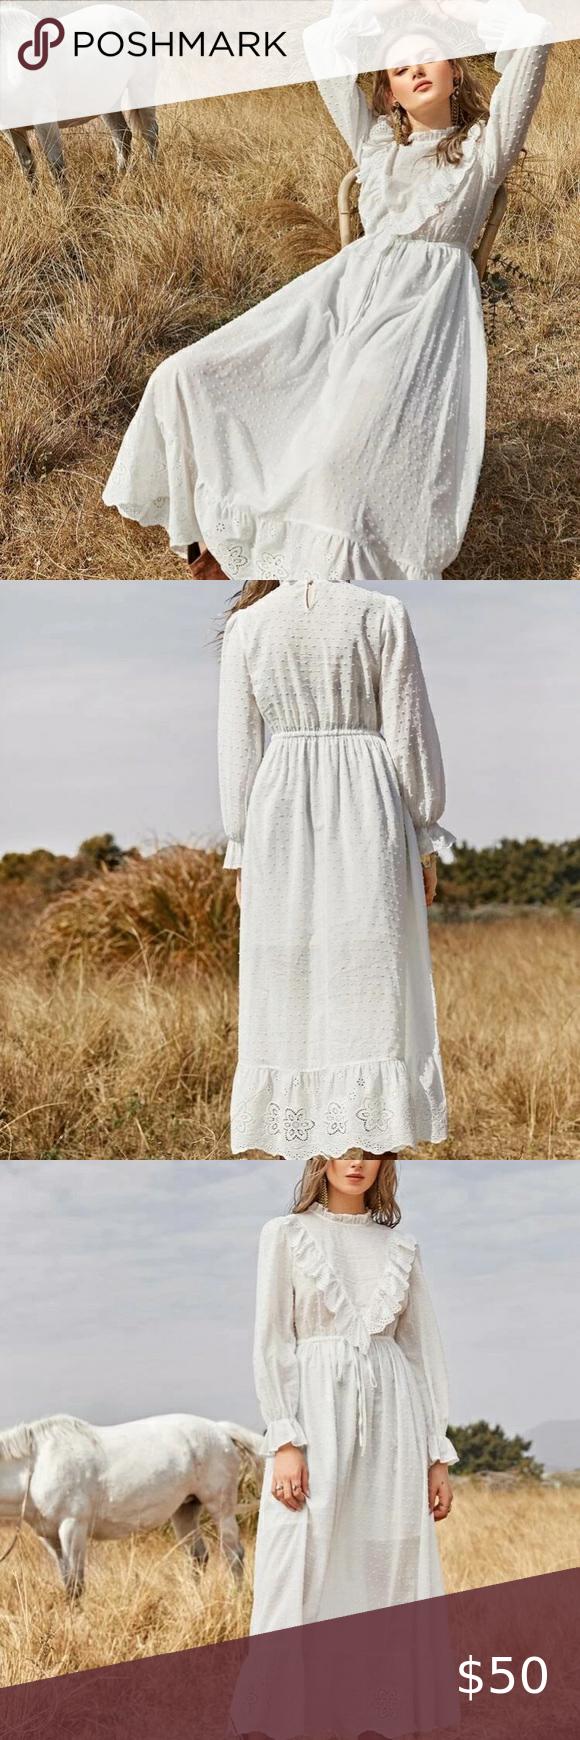 Vintage Ruffle White Dress Lace Dress Vintage Lace Wedding Dress Vintage Vintage Flapper Dress [ 1740 x 580 Pixel ]